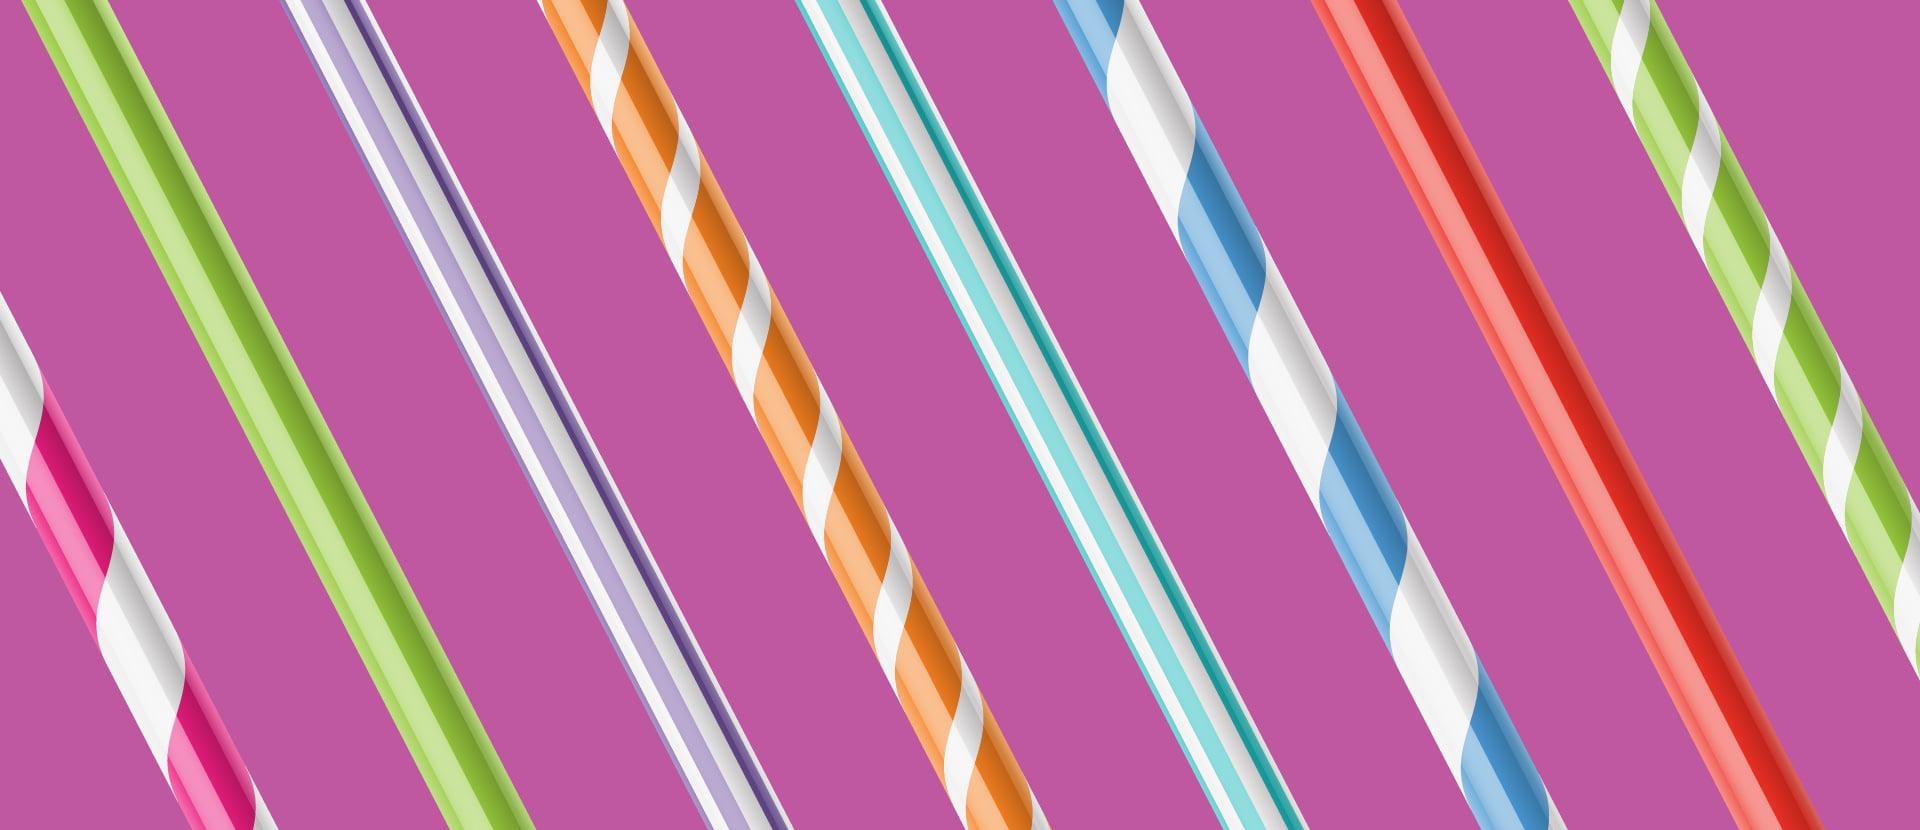 Plastic straws alternatives